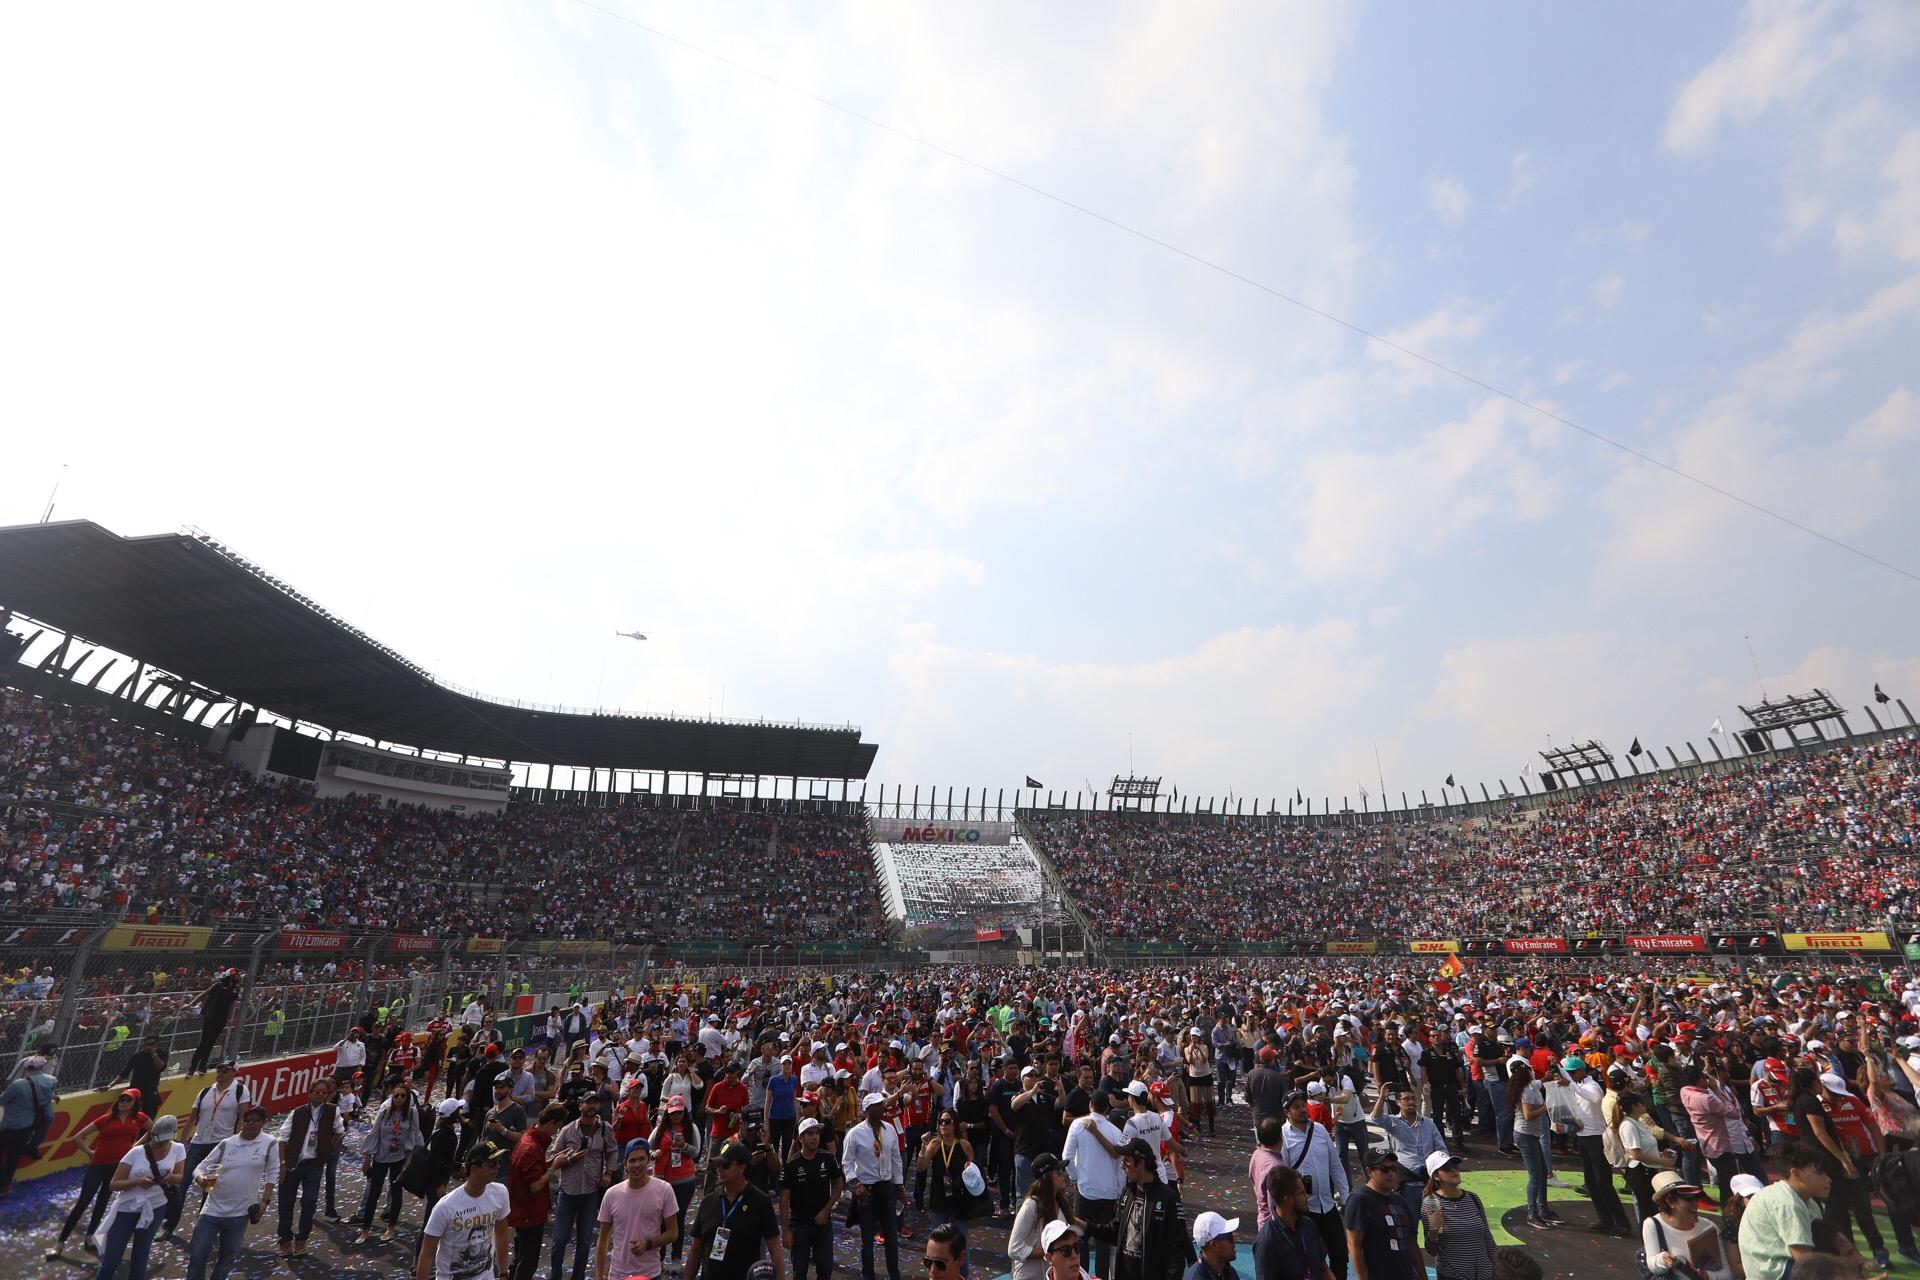 Formule 1 GP Mexico – 5***** Hotelovernachtingen – Autódromo Hermanos Rodríguez 2021